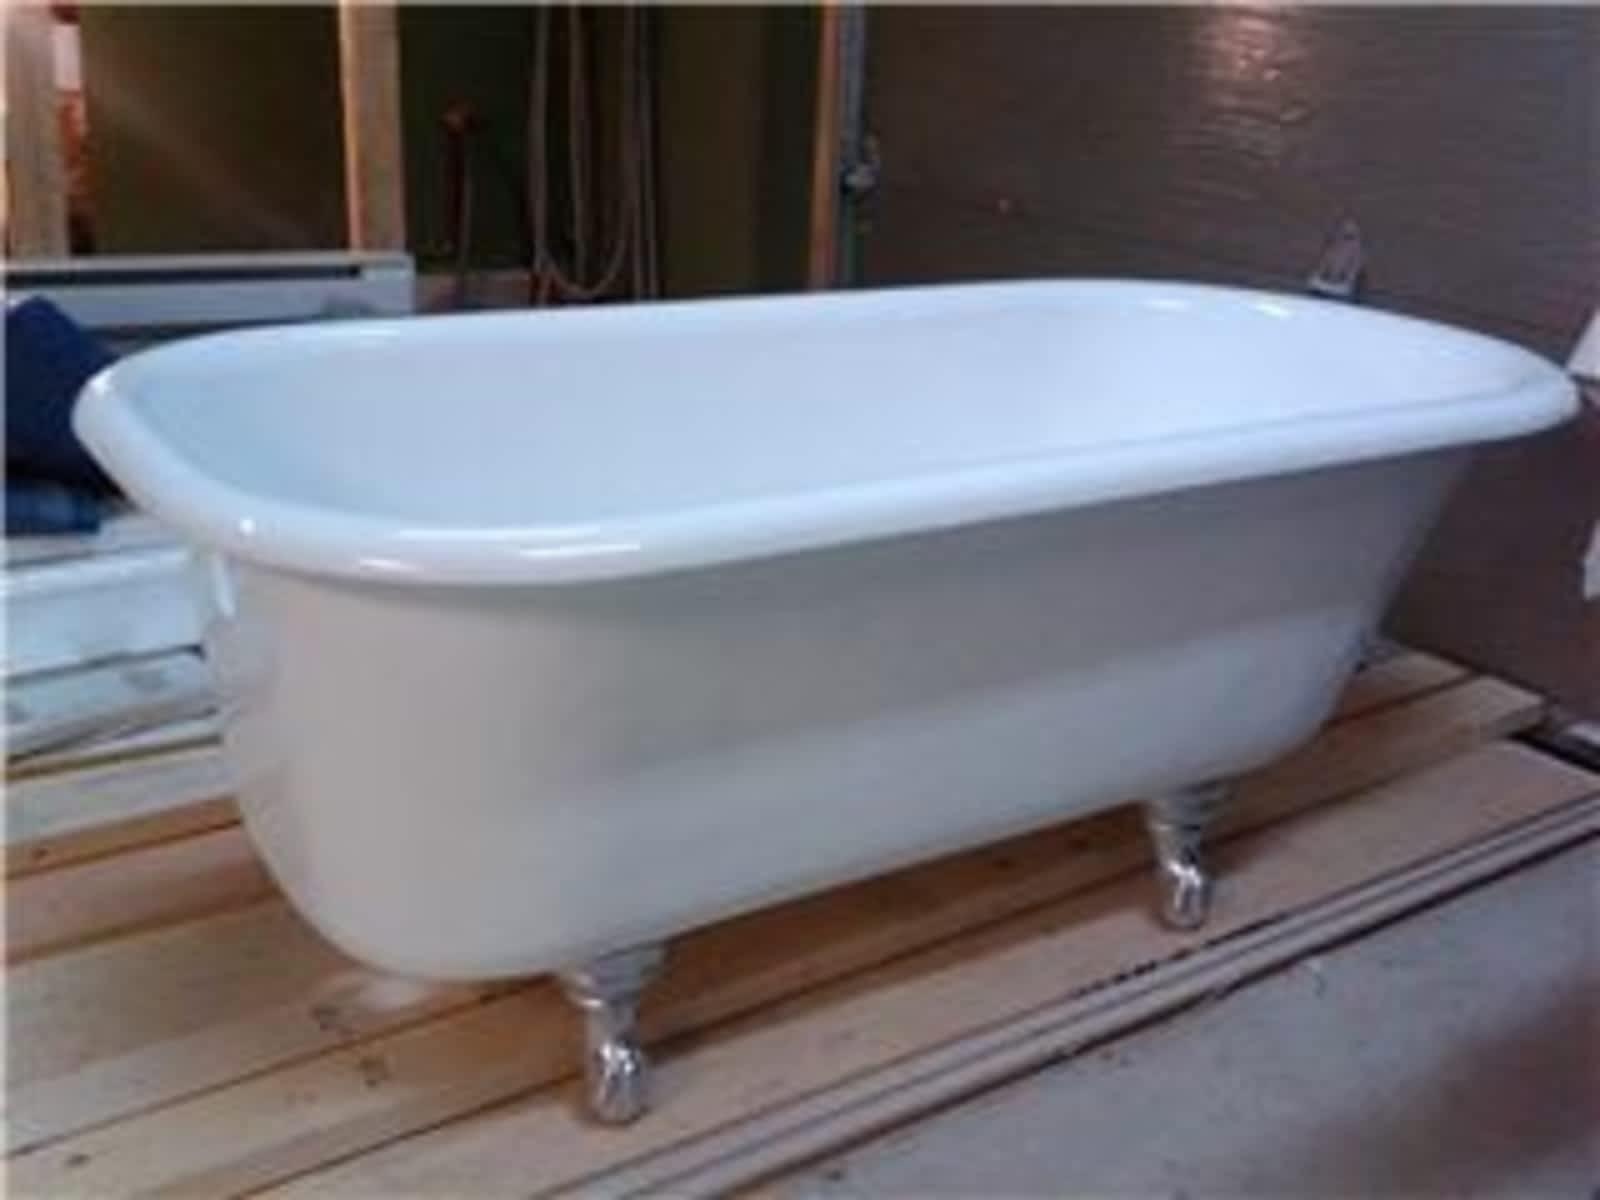 dessin baignoire ancienne with dessin baignoire ancienne. Black Bedroom Furniture Sets. Home Design Ideas